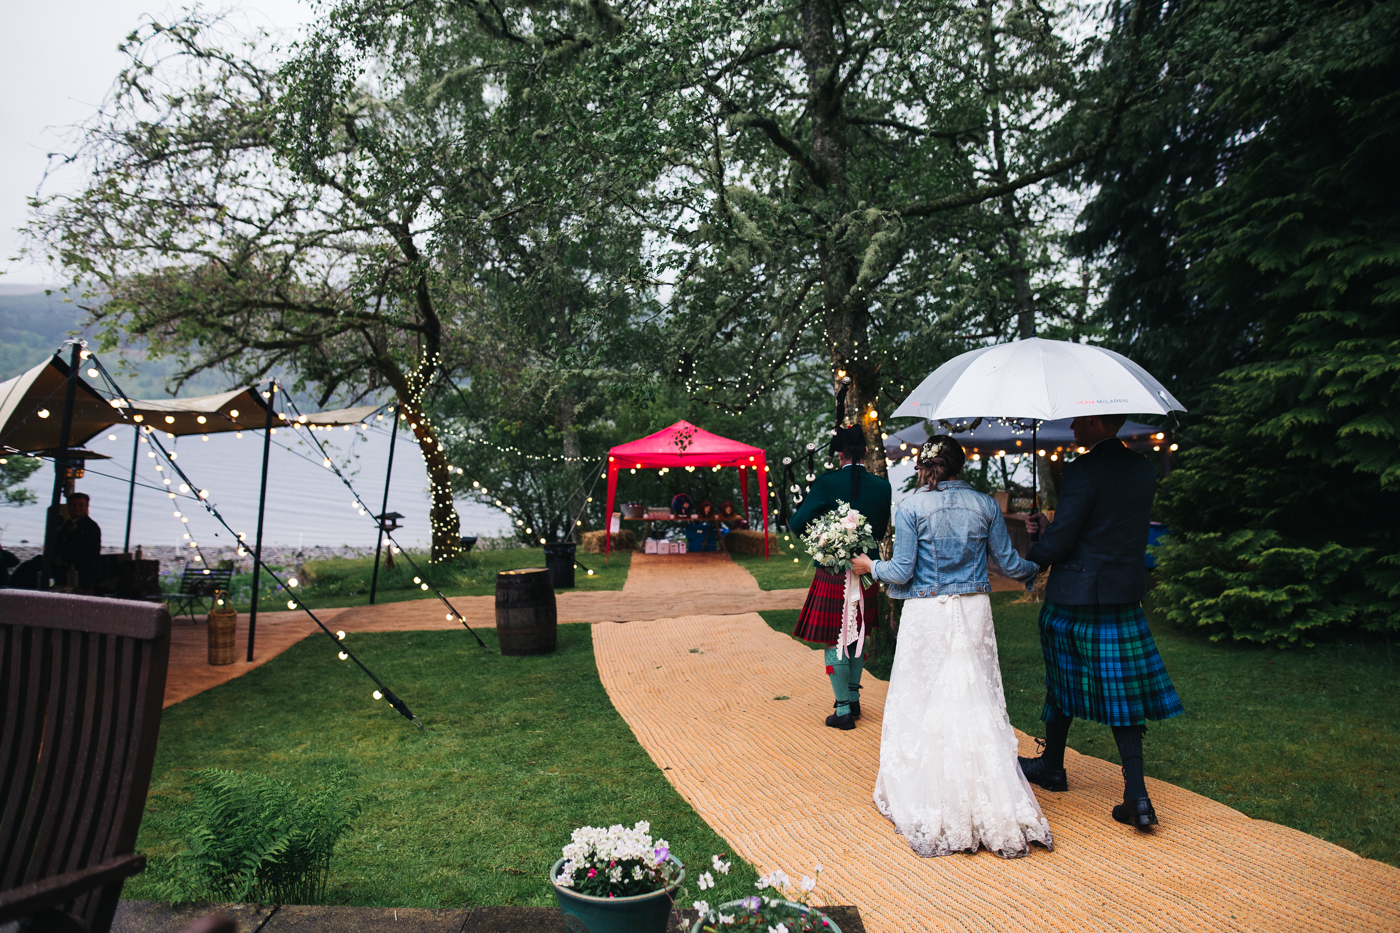 scottish-wedding-trossachs-loch-tay-highlannds-relaxed-photography-photographer-0046.jpg